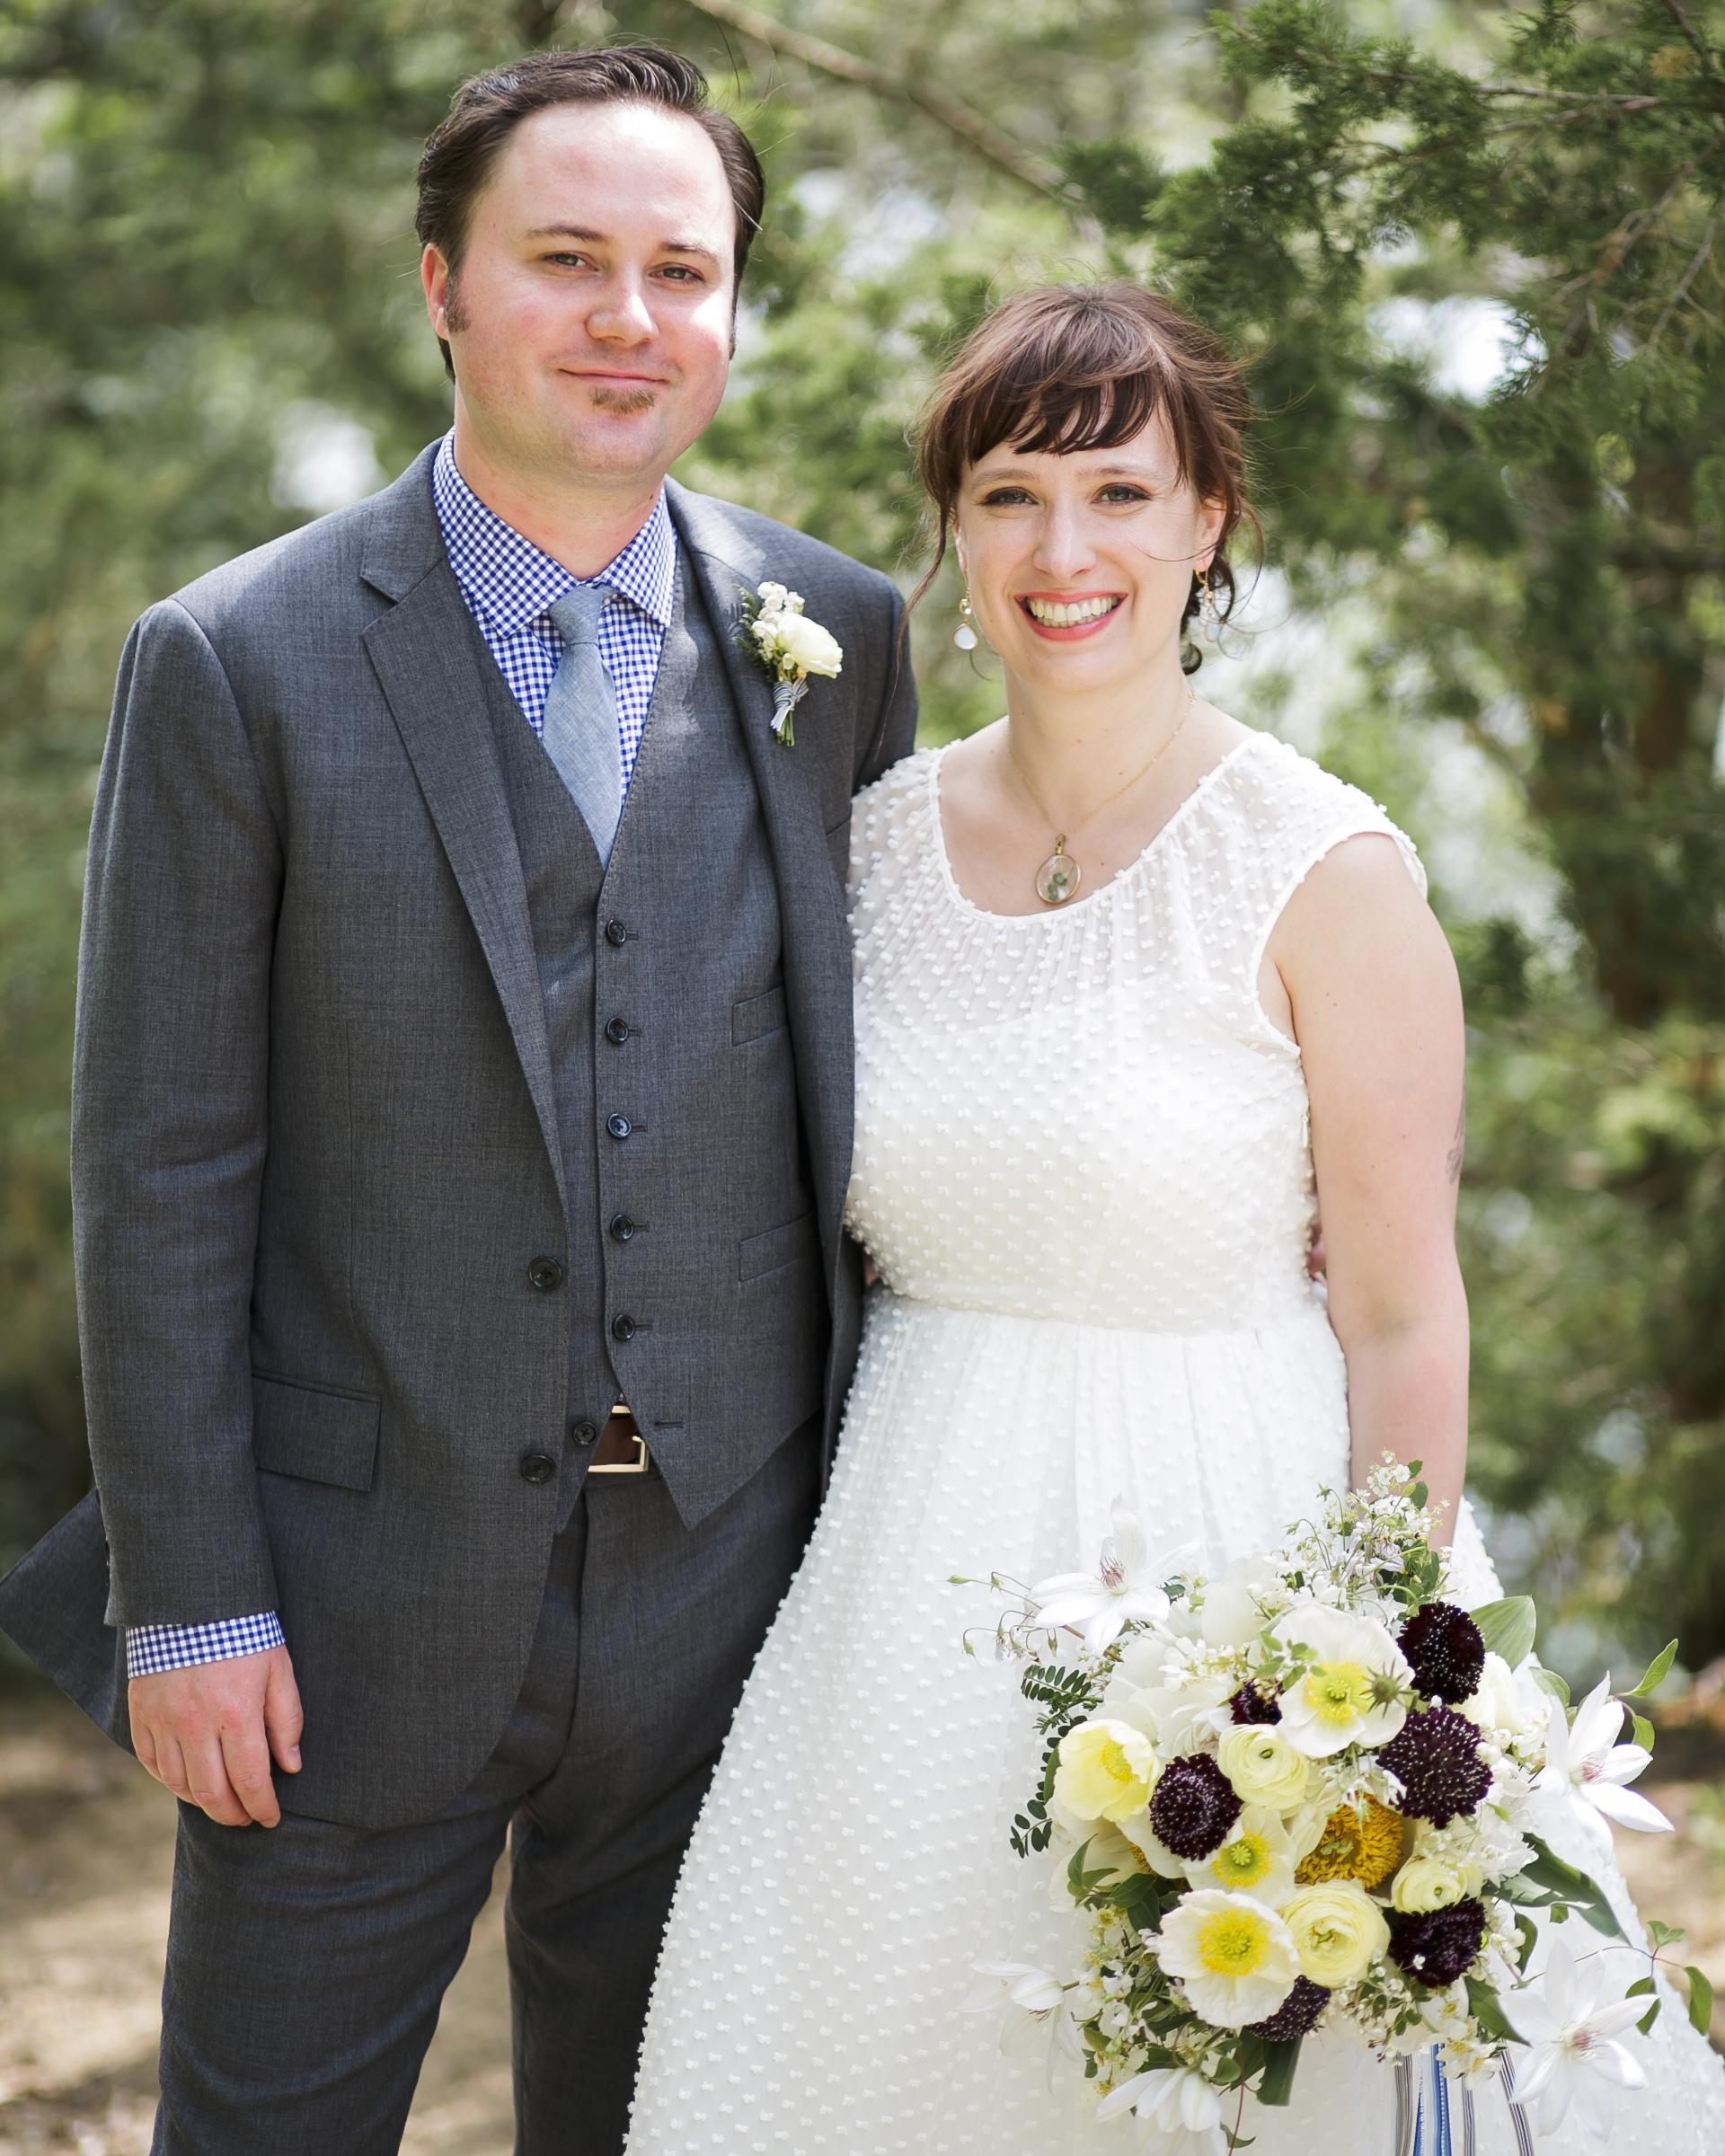 kelly-marie-dave-wedding-portrait6-0414.jpg